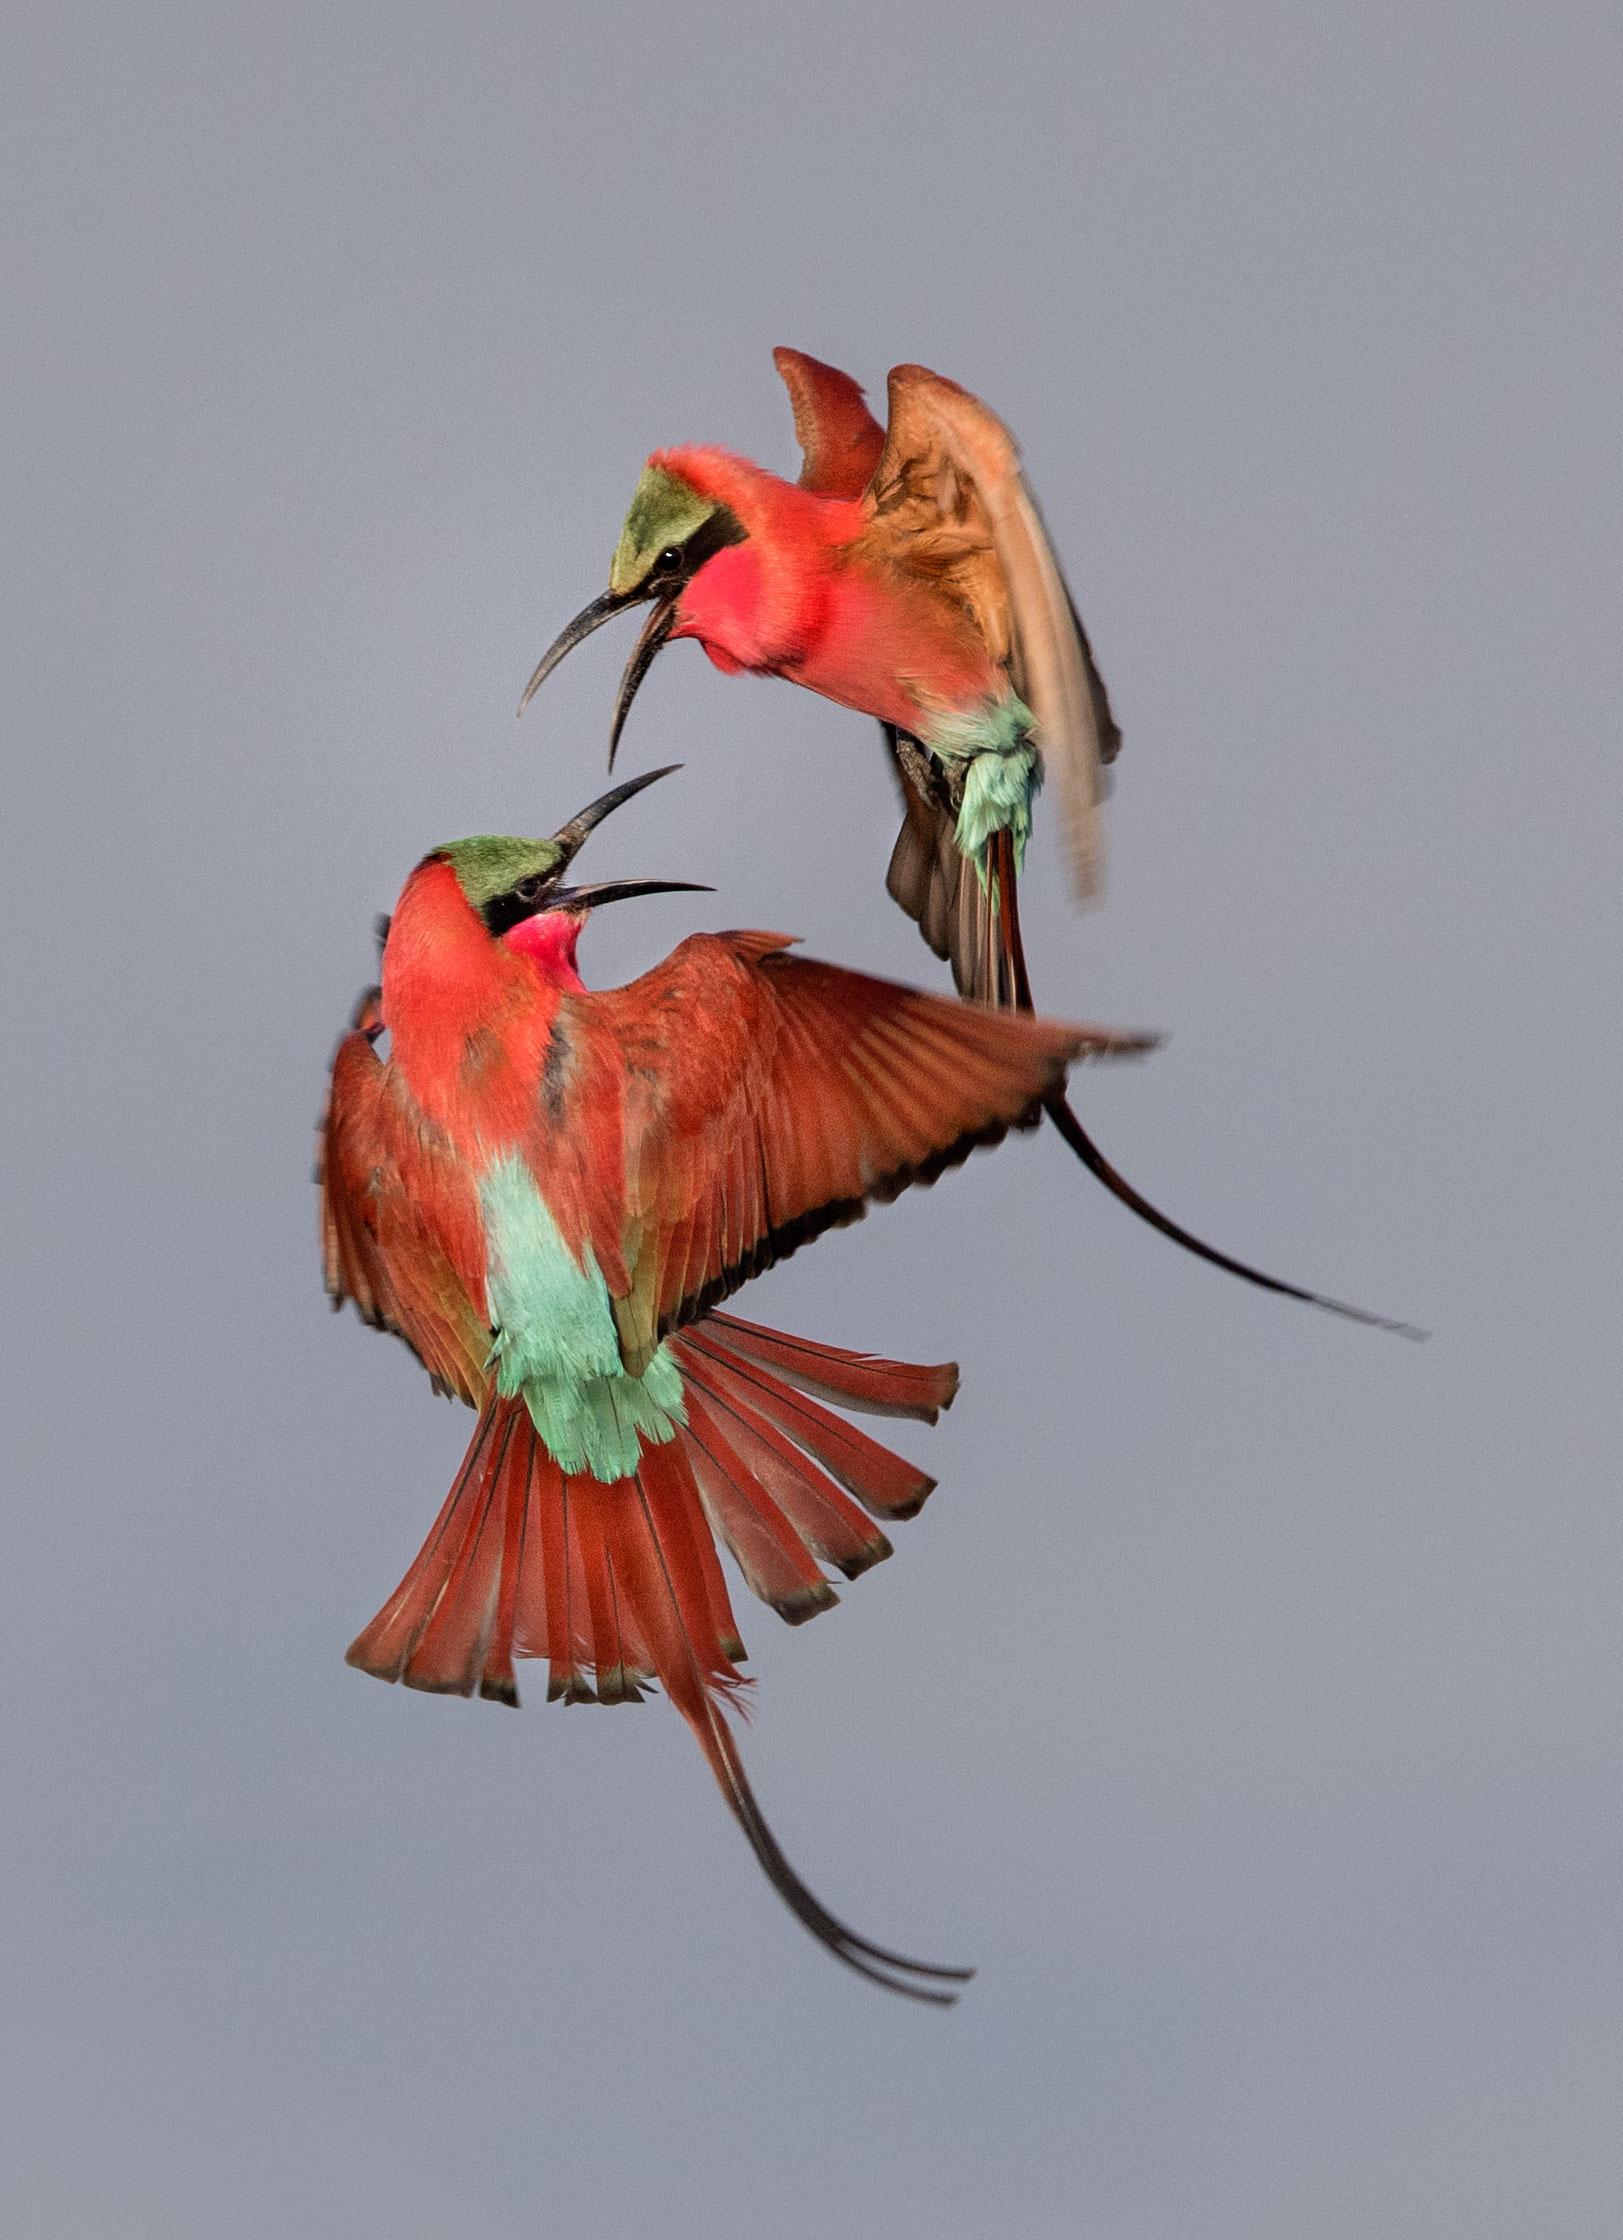 Southern Carmine Bee-eaters. Zachary Webster/Audubon Photography Awards